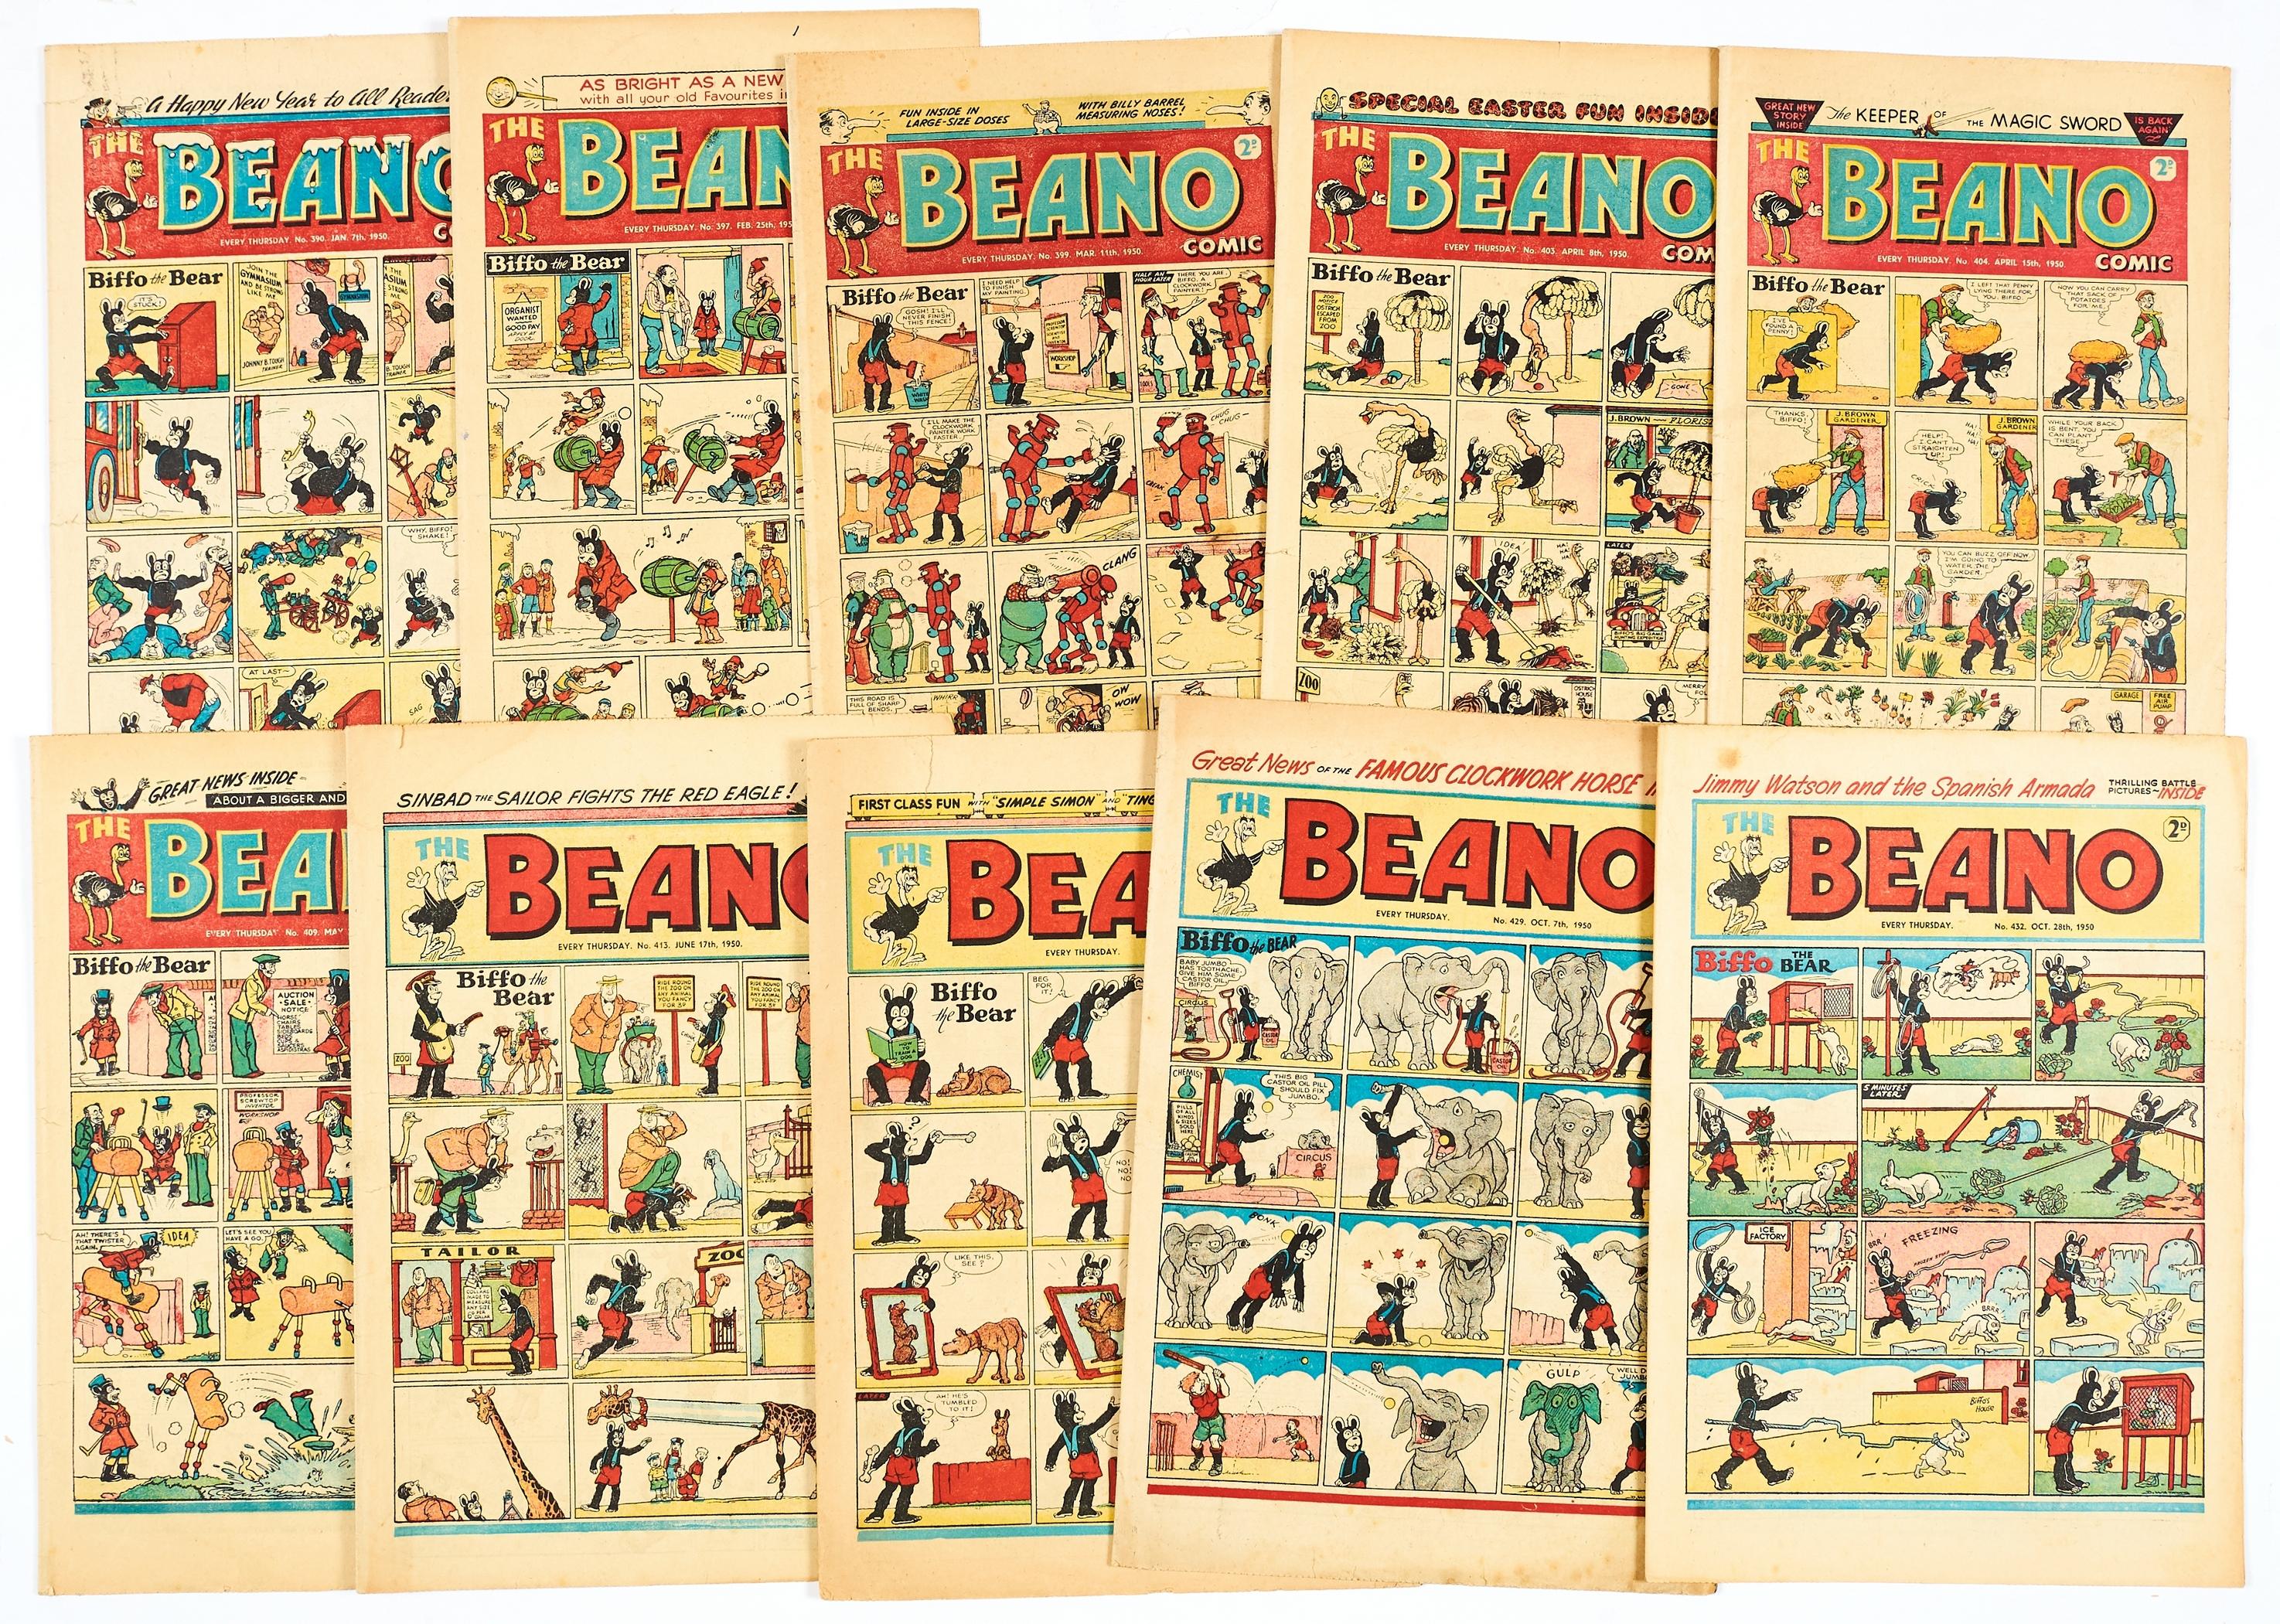 Lot 41 - Beano (1950) 390 New Year, 397, 399, 403 Easter, 404, 409, 413, 415, 429, 432 [vg/fn-] (10)